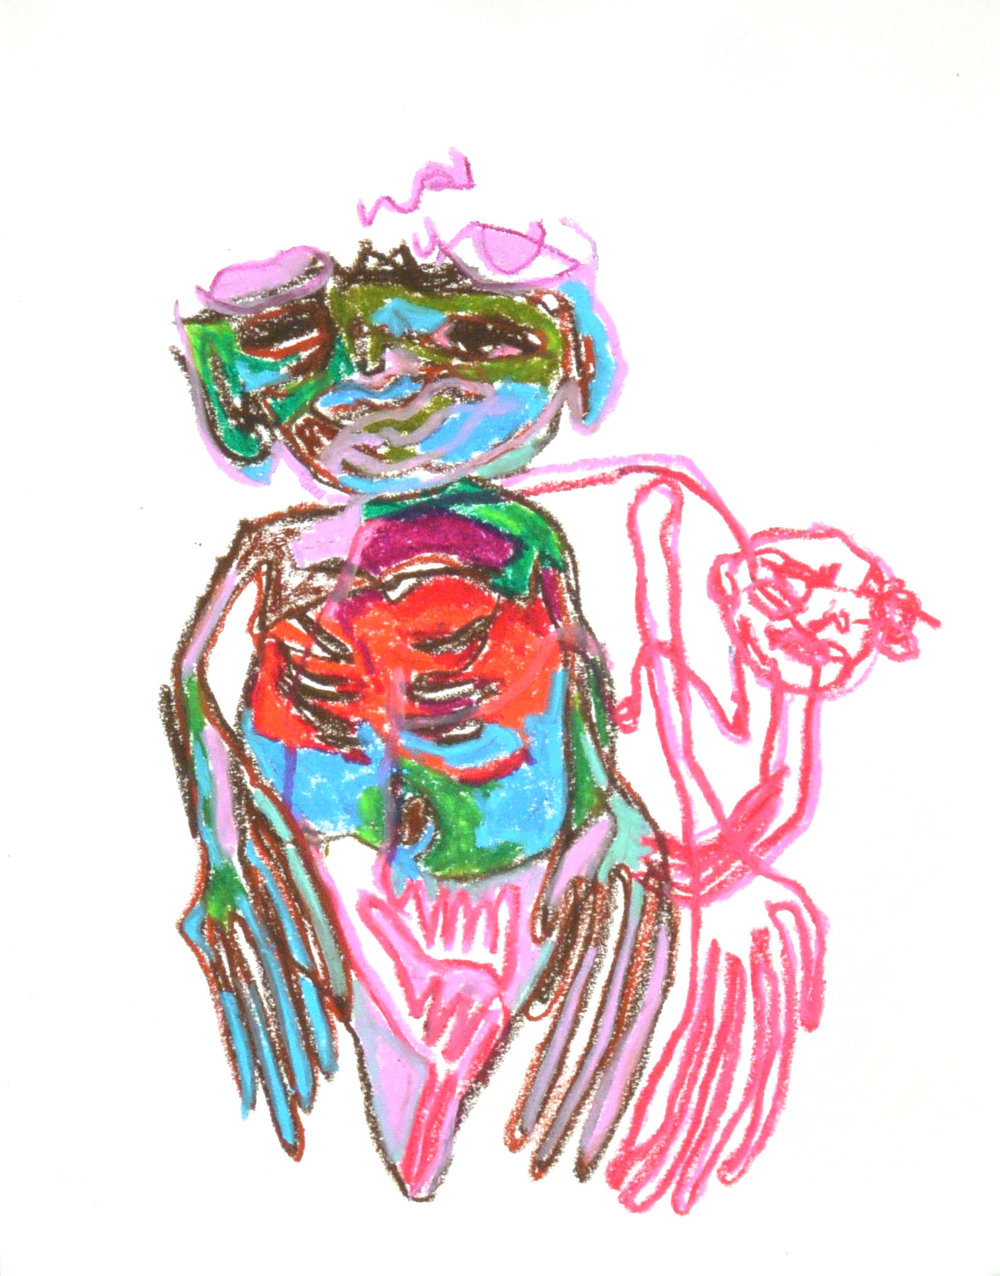 Twig, larva, drape , 2019. Oil Pastel. 14 x 11 in.